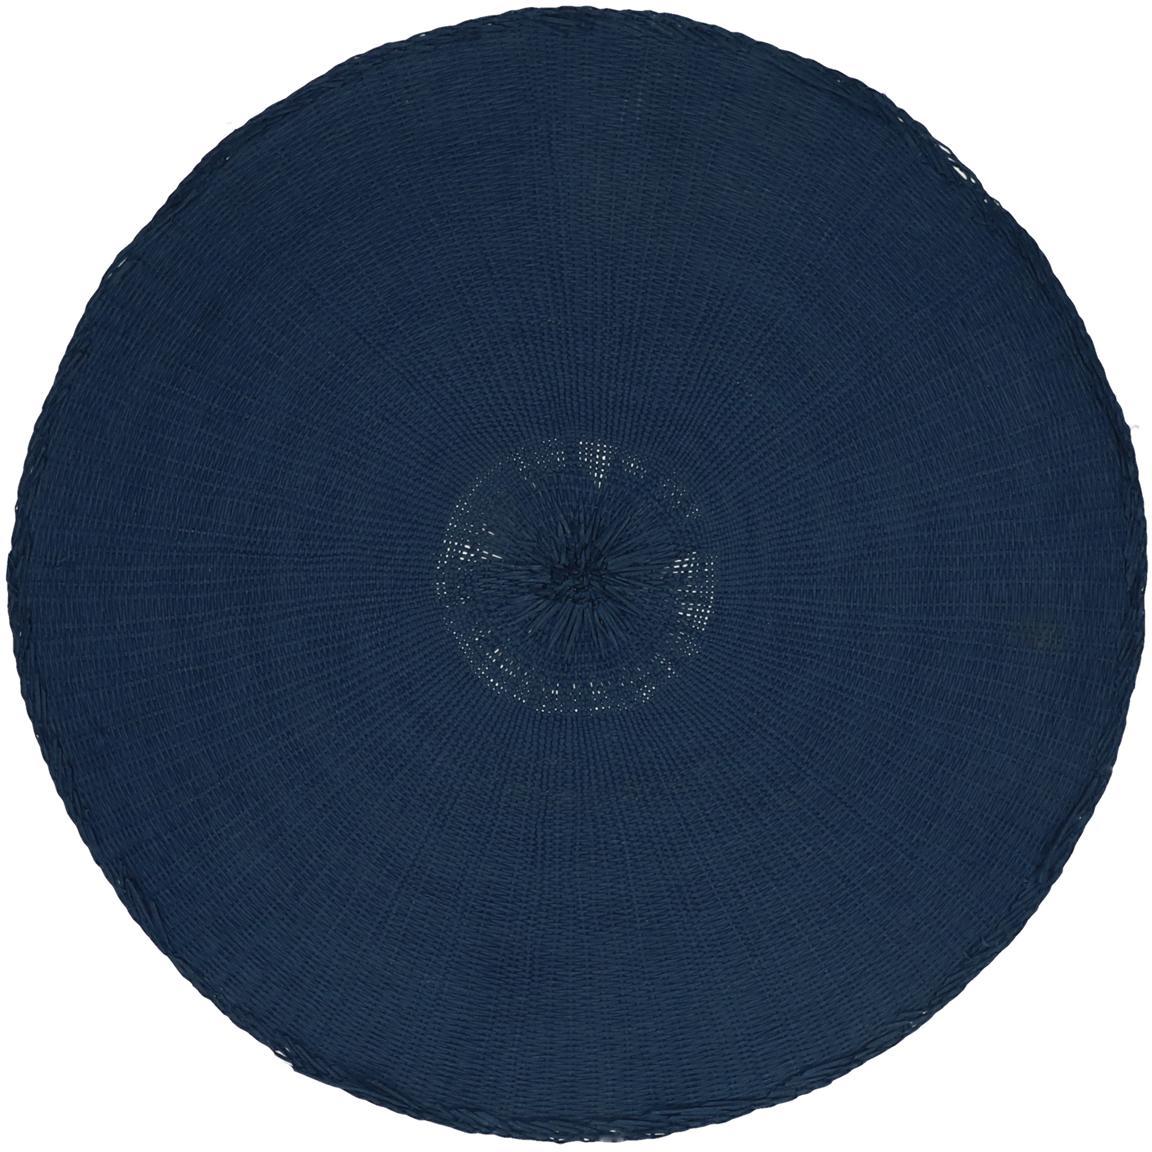 Manteles individuales redondos Kolori, 2uds., Fibras de papel, Azul, Ø 38 cm